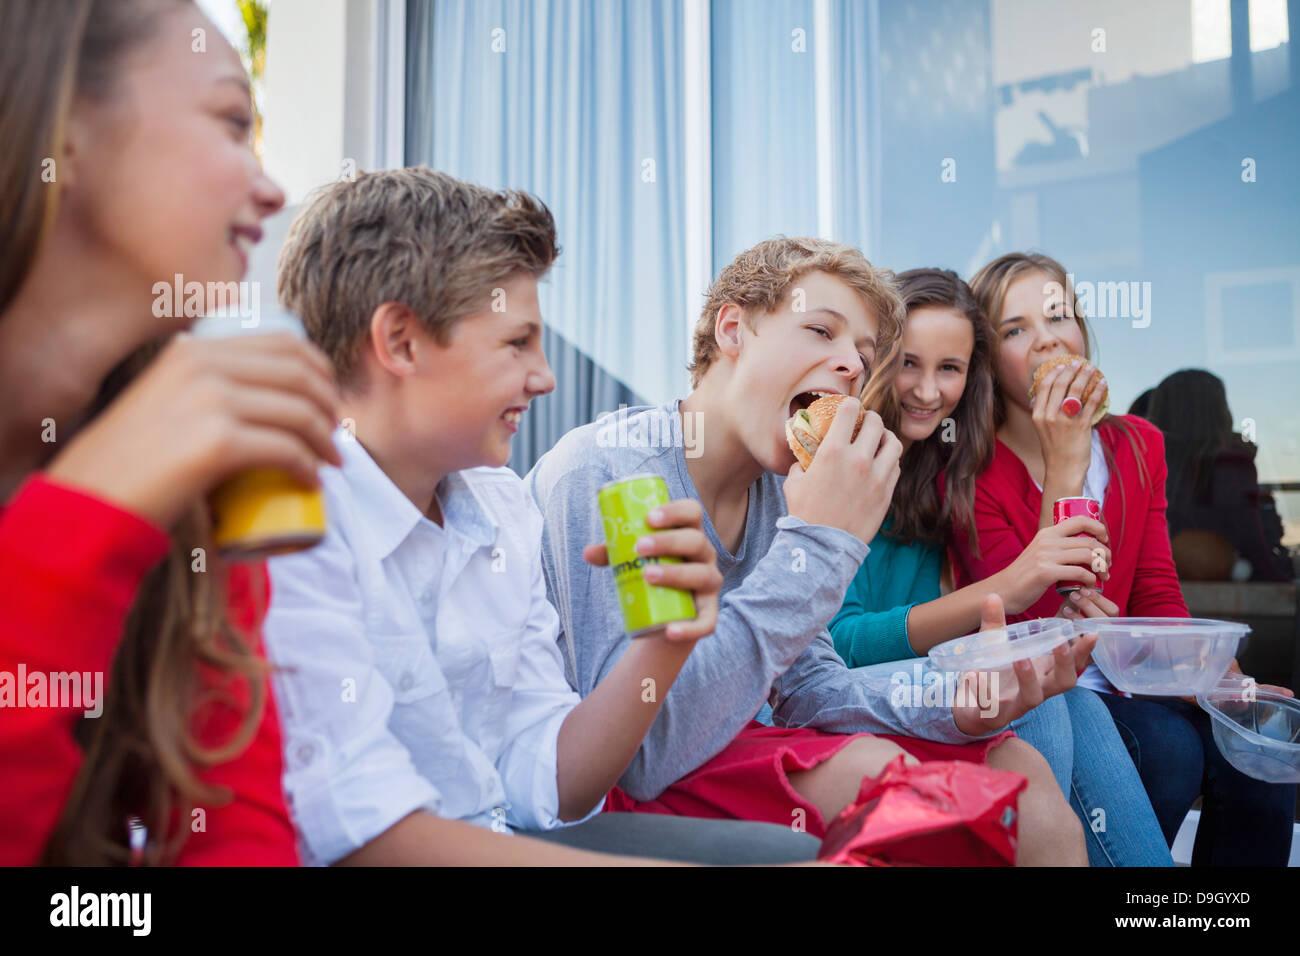 Friends enjoying fast food together - Stock Image